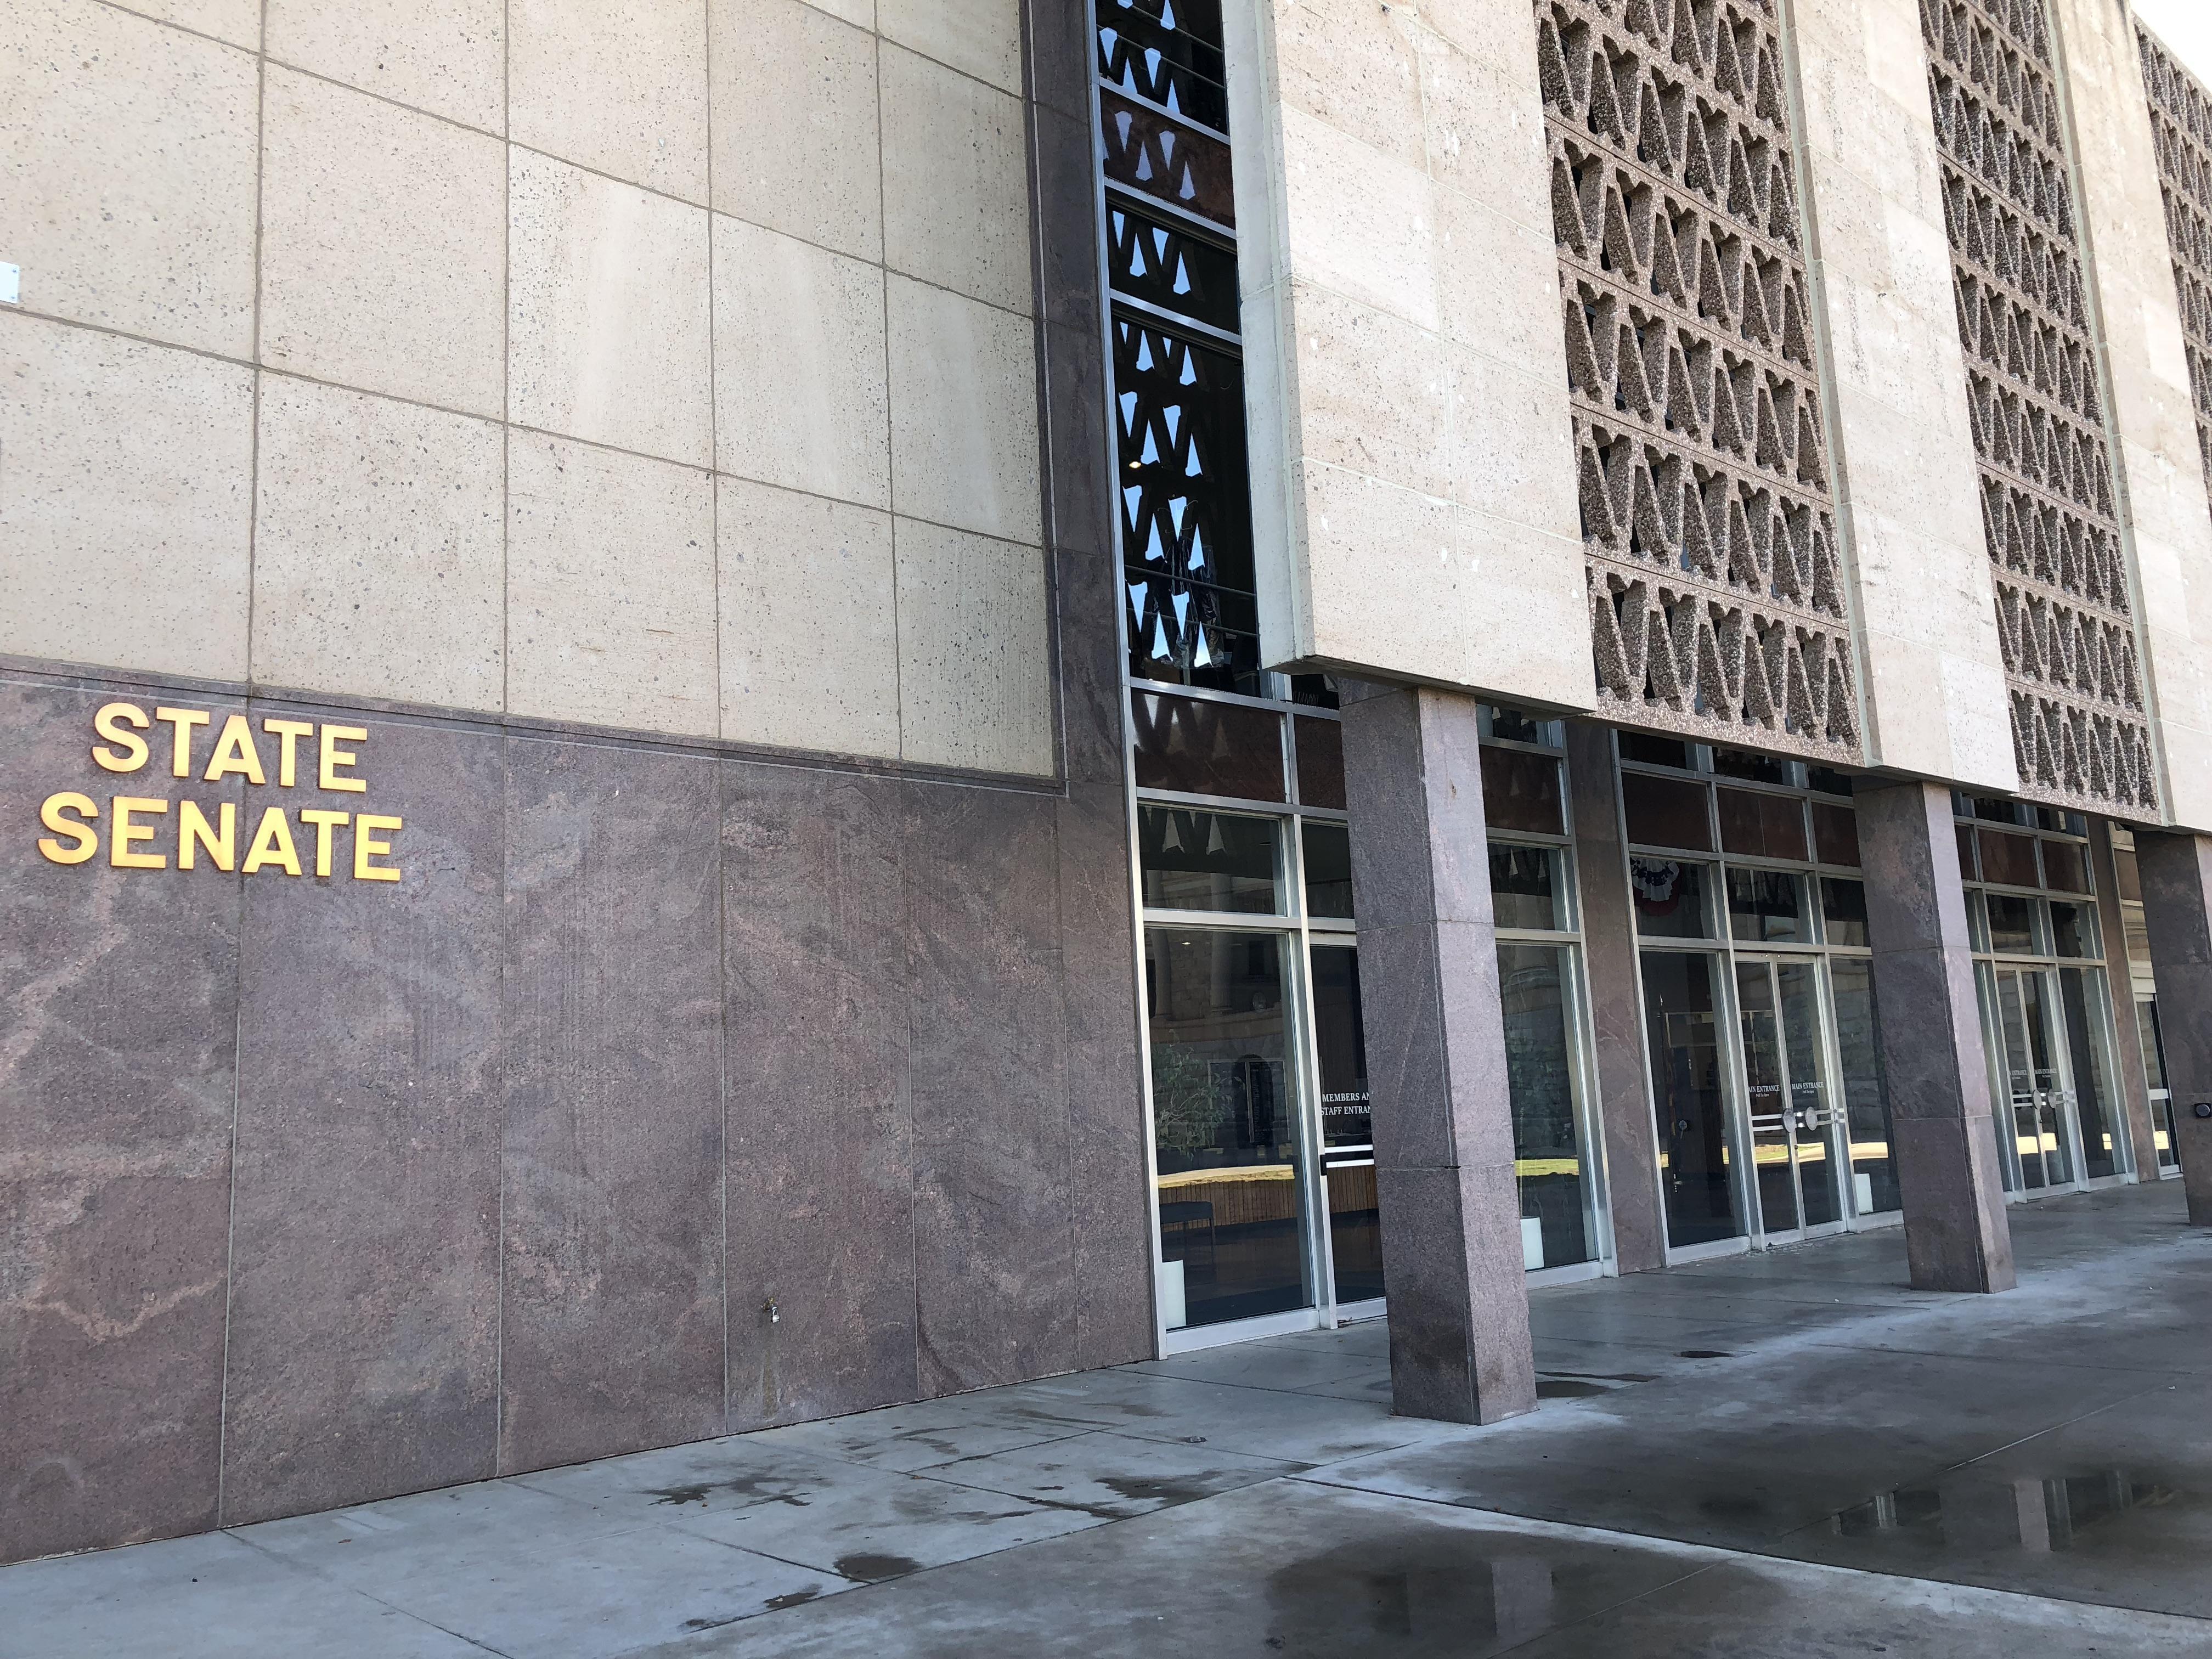 Arizona Senate building